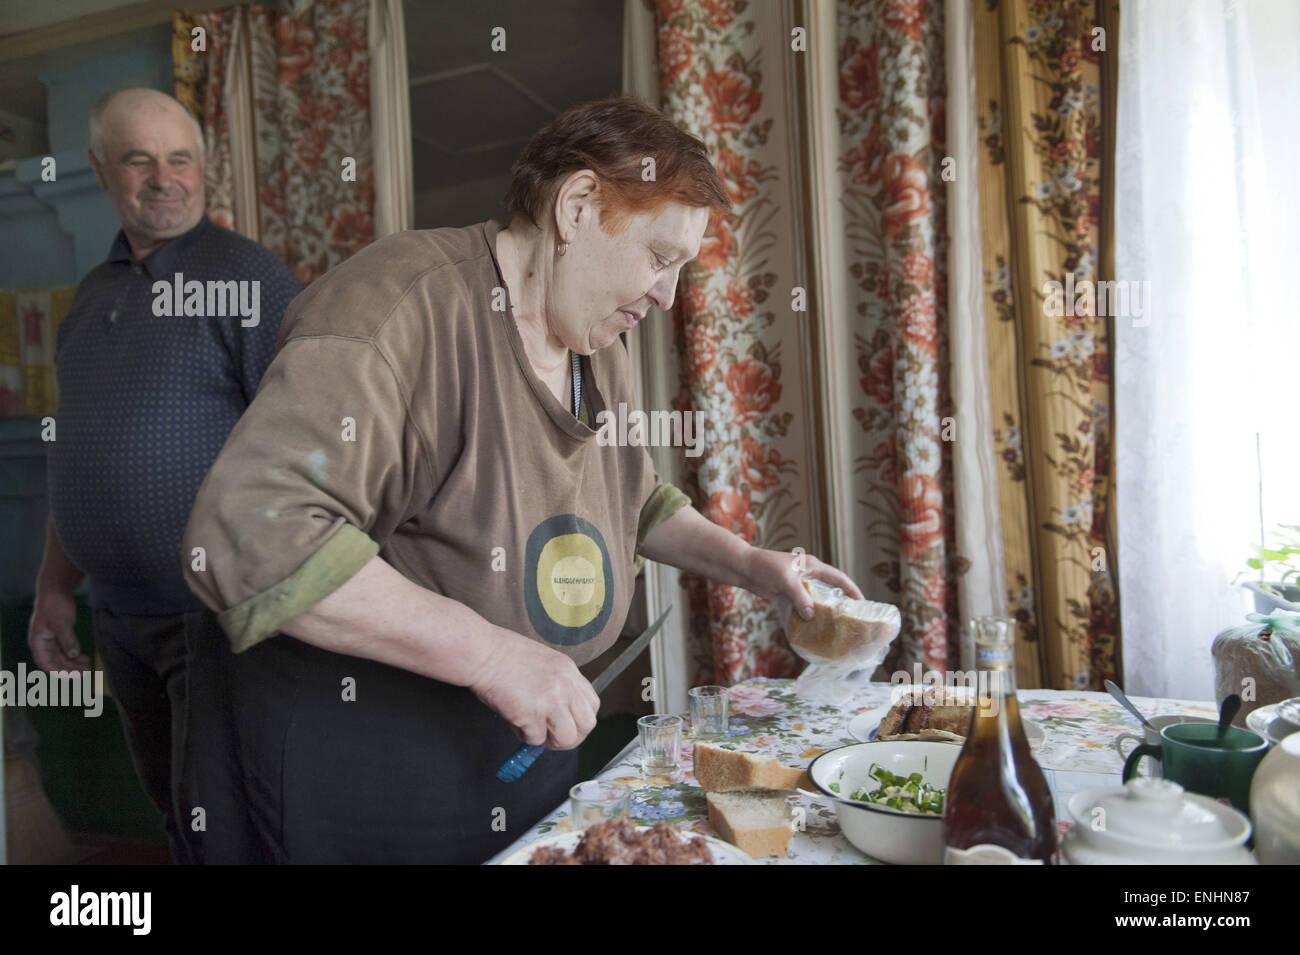 April 24, 2015 - Chernobyl, Ukraine - Ukraine. Pripyat. Chernobyl. Mr and mrs Lavriejenko. He is 59 en she 61...Several - Stock Image